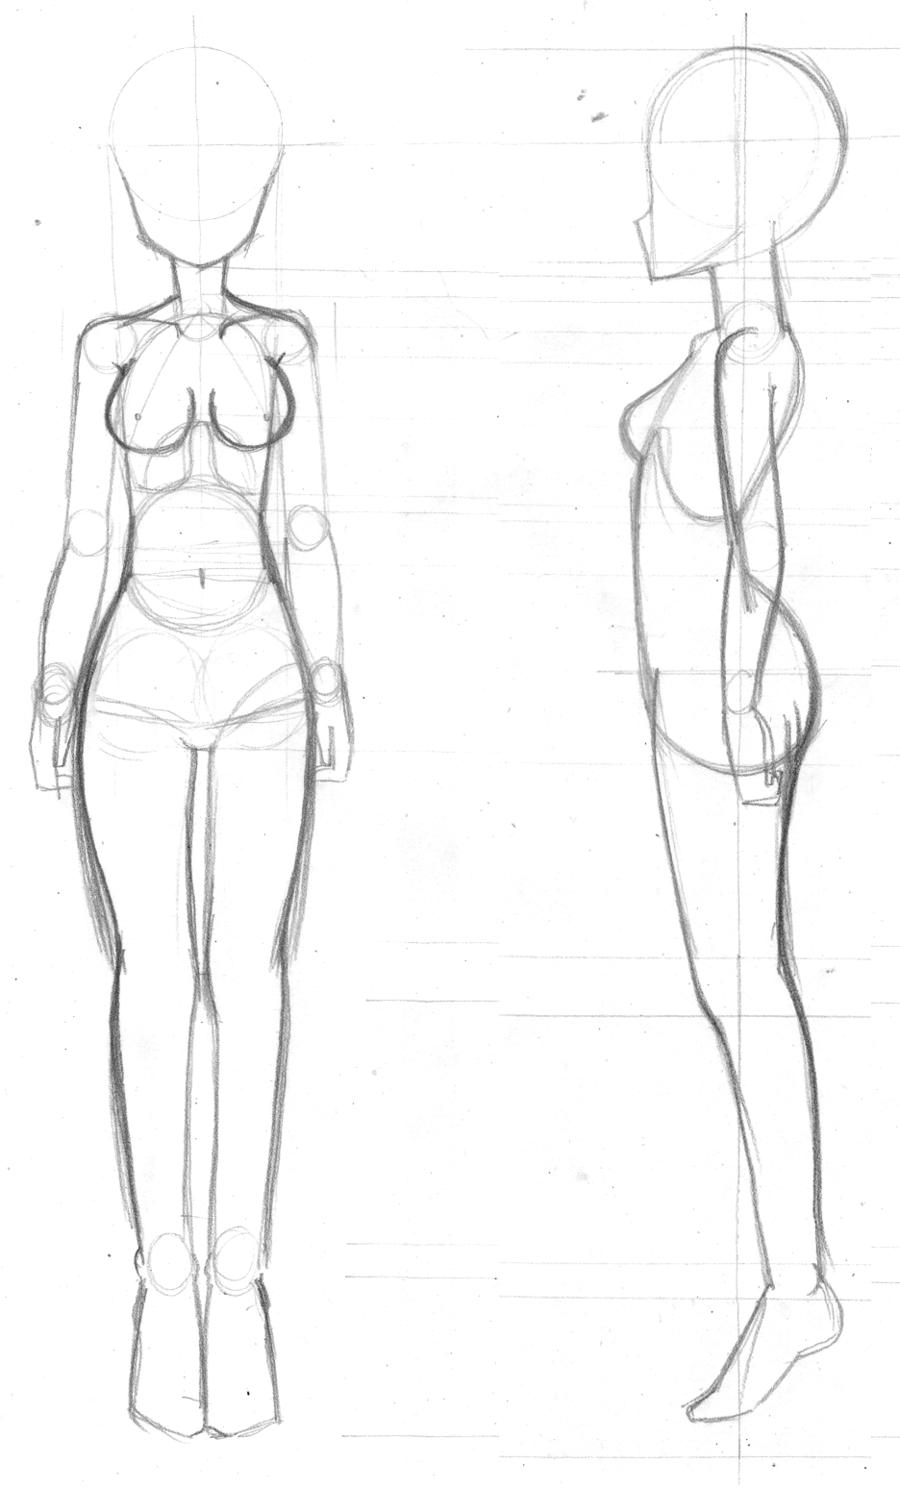 Manga Bodys Body Drawing Drawings Anime Drawings Tutorials